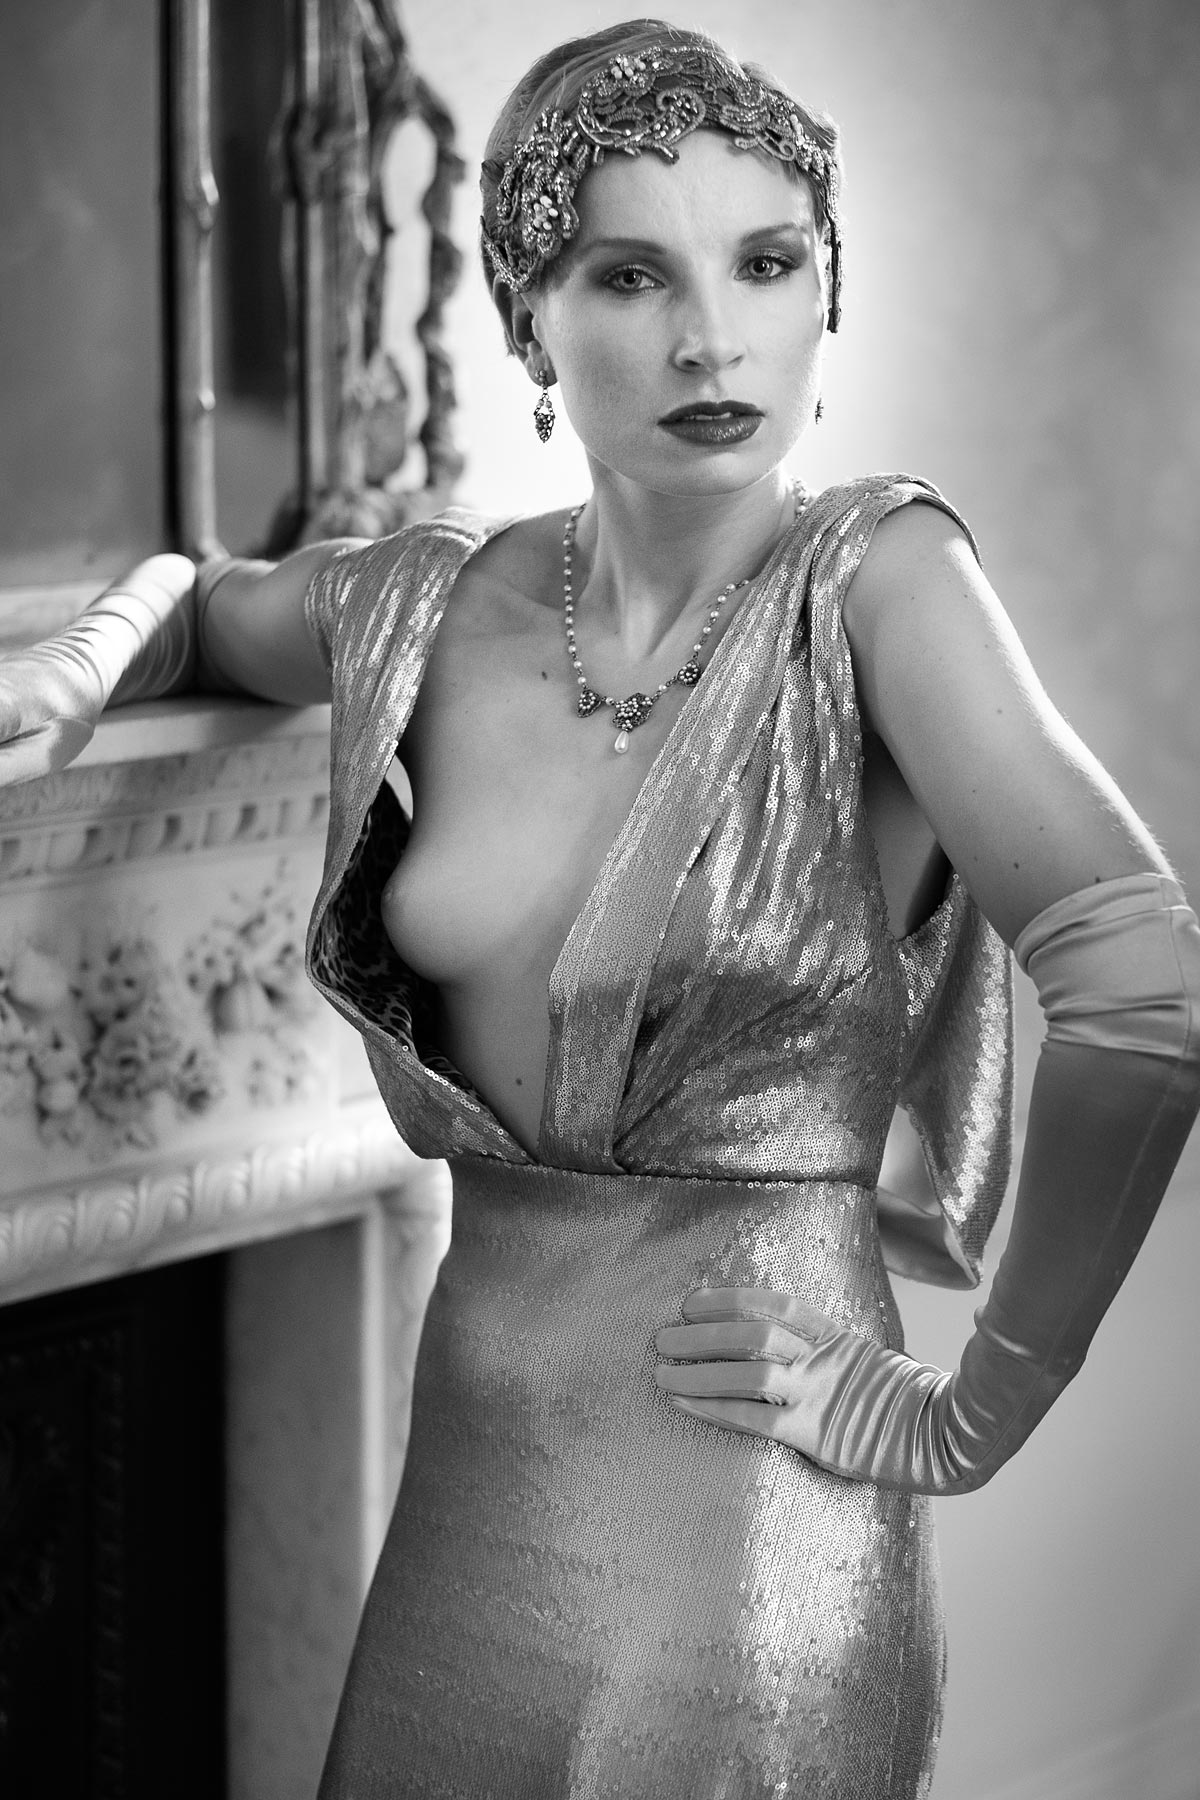 Mina Renoir dress slip at Clifton Hill House - Monochrome